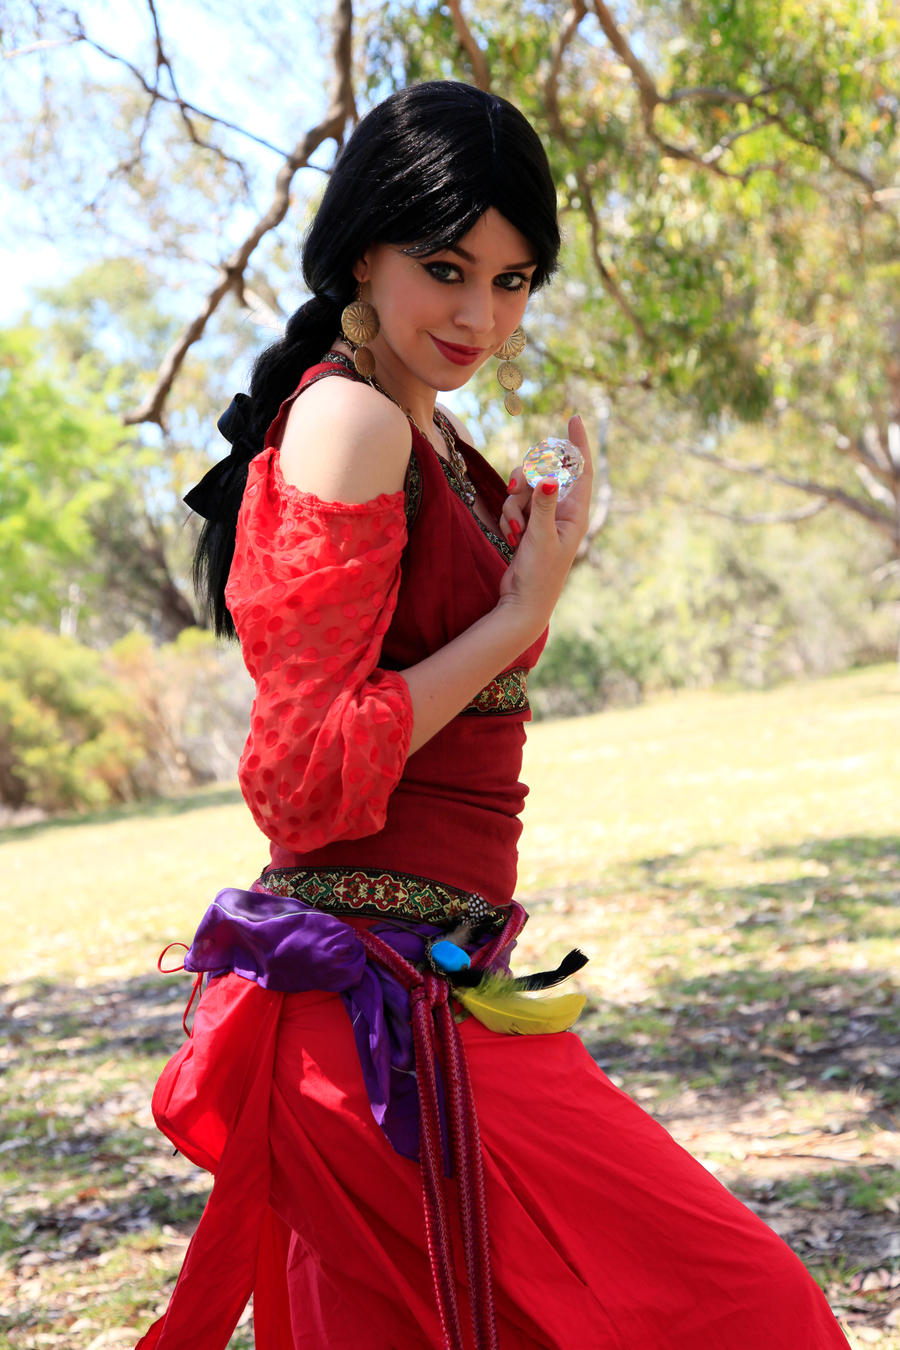 Gypsy Portrait by faestock